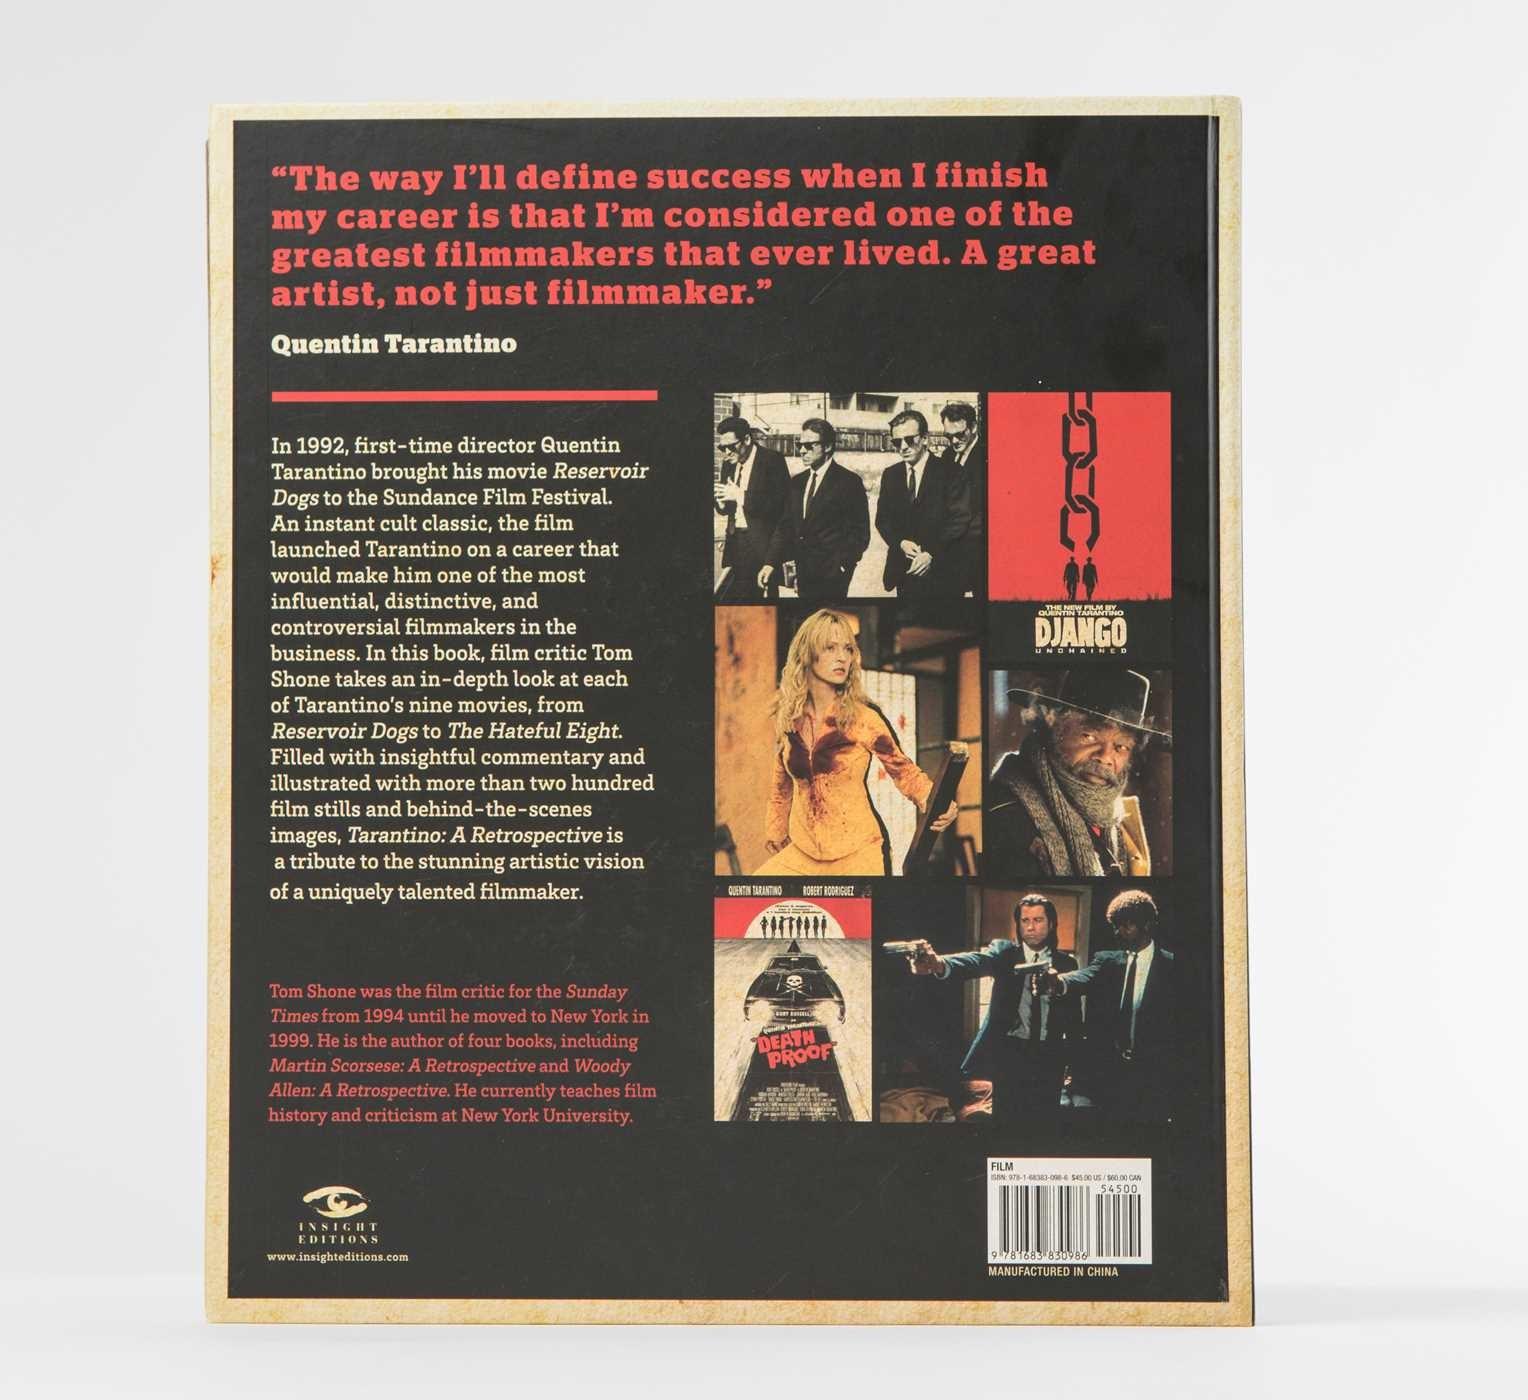 Tarantino a retrospective 9781683830986.in06